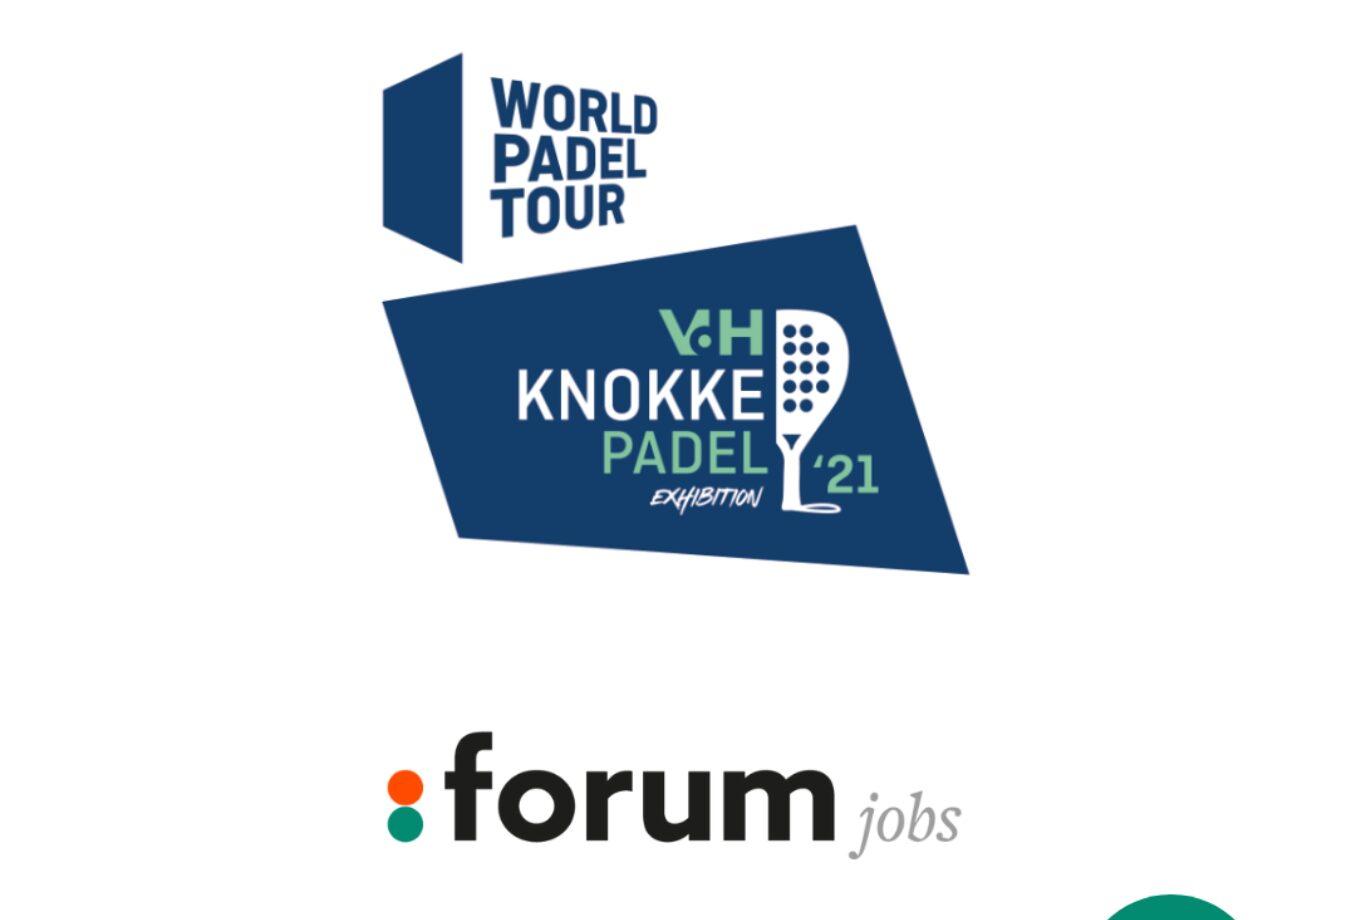 Forum Jobs is trotse sponsor van de World Padel Tour in Knokke